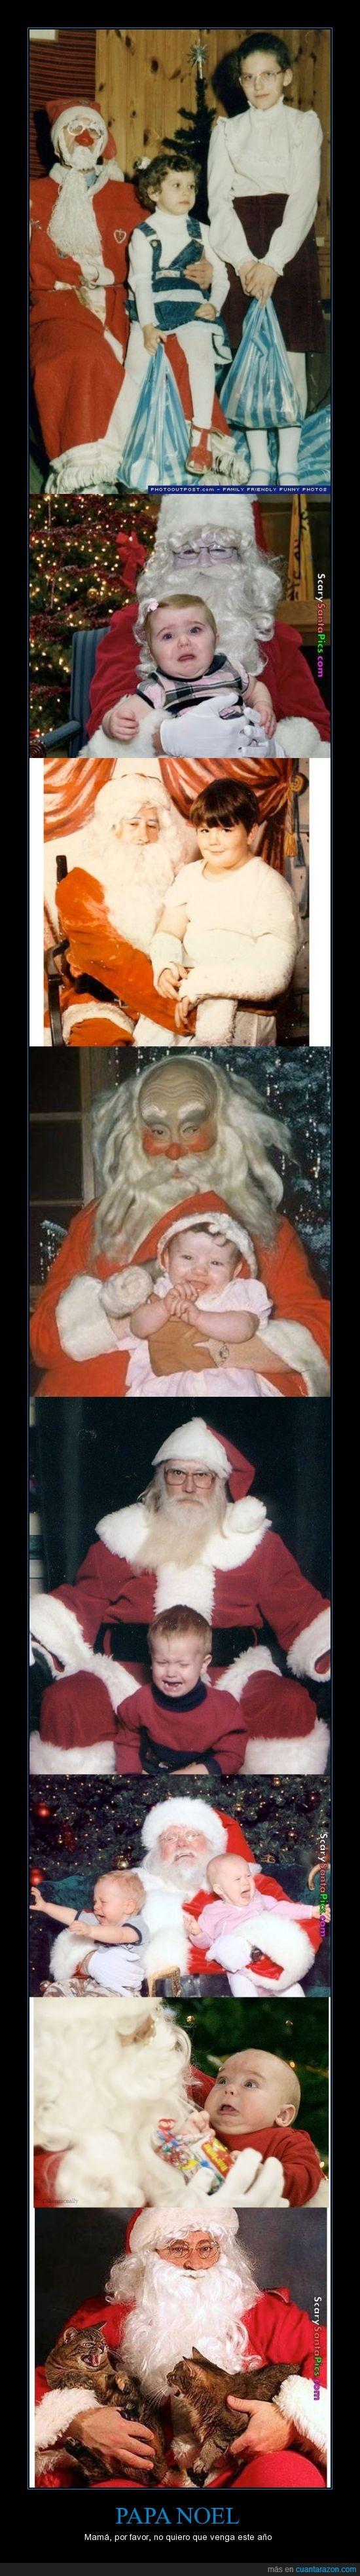 bizarro,falso,gato,llora,miedo,navidad,niño,papa noel,peluca,santa claus